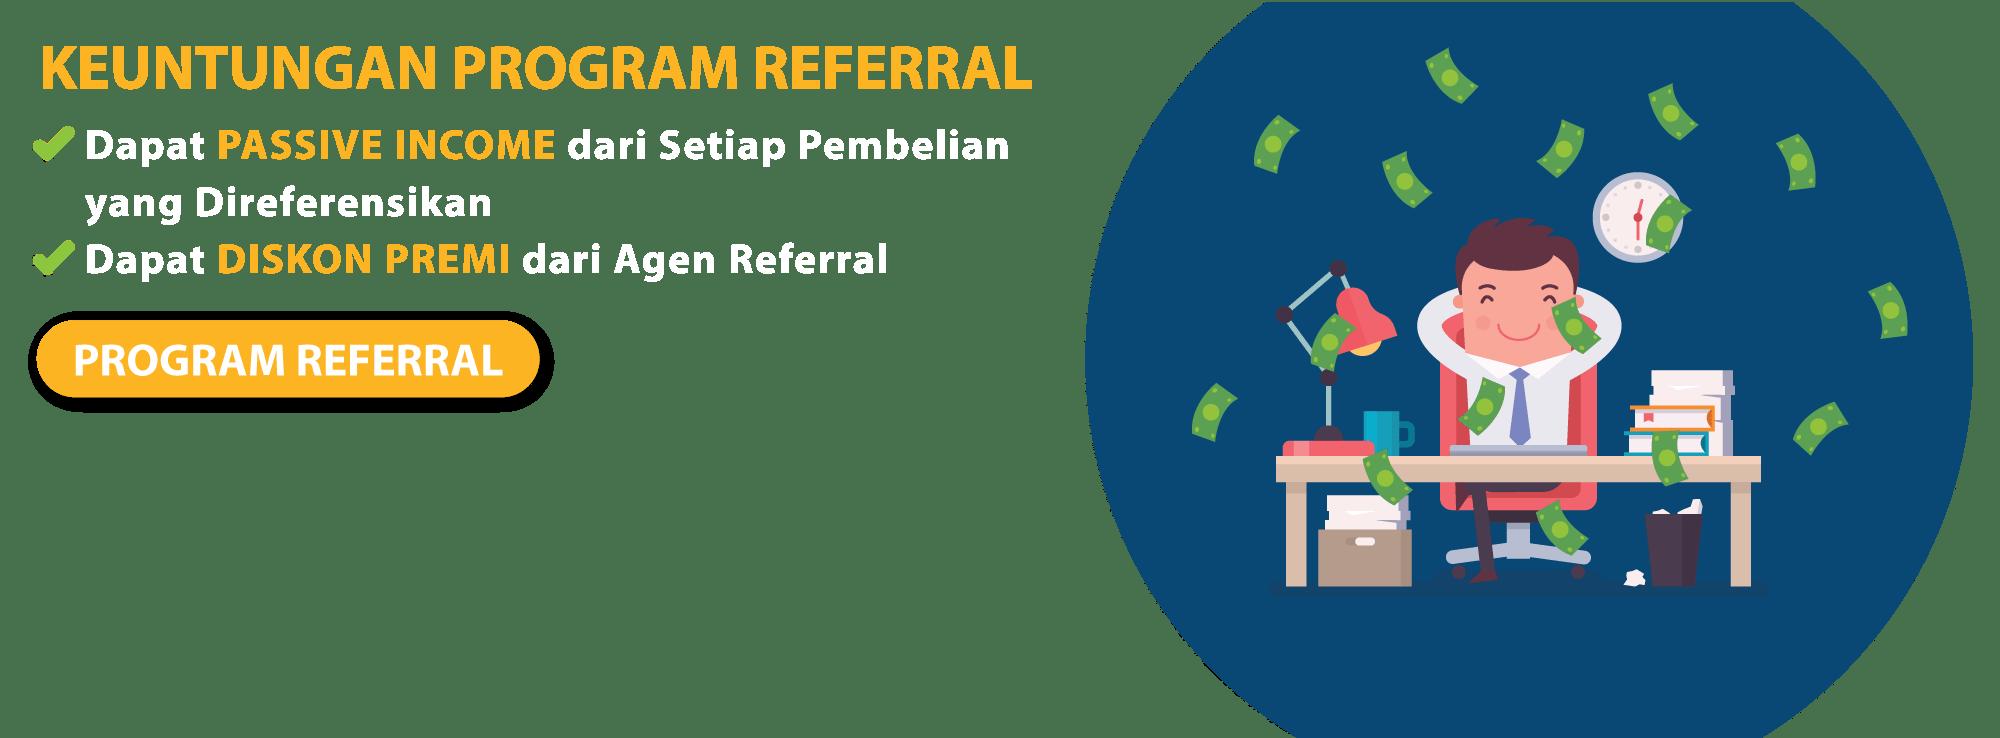 Agen Referral